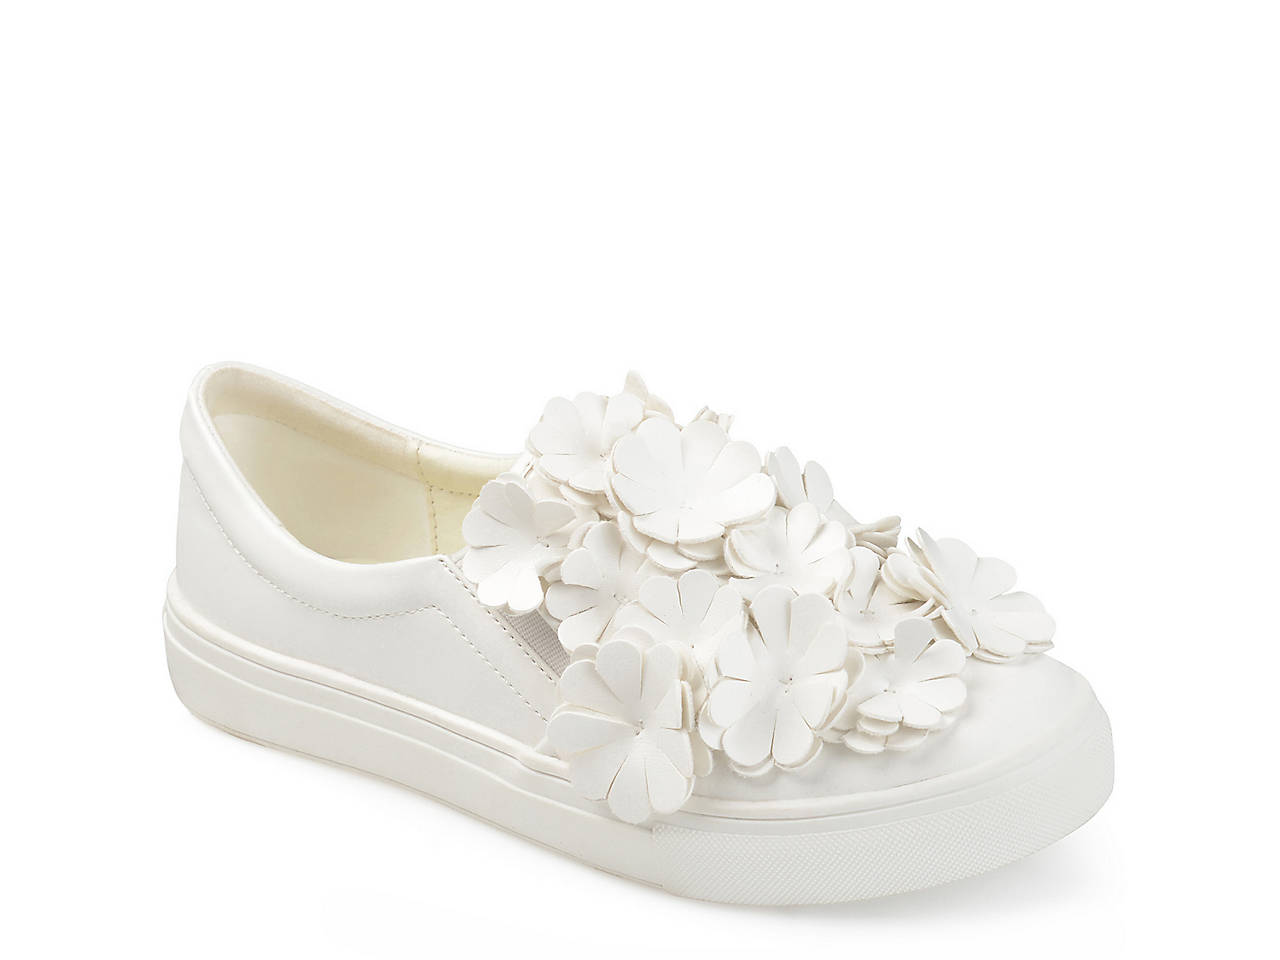 8f9635478d0 Journee Collection Mizey Slip-On Sneaker Women s Shoes